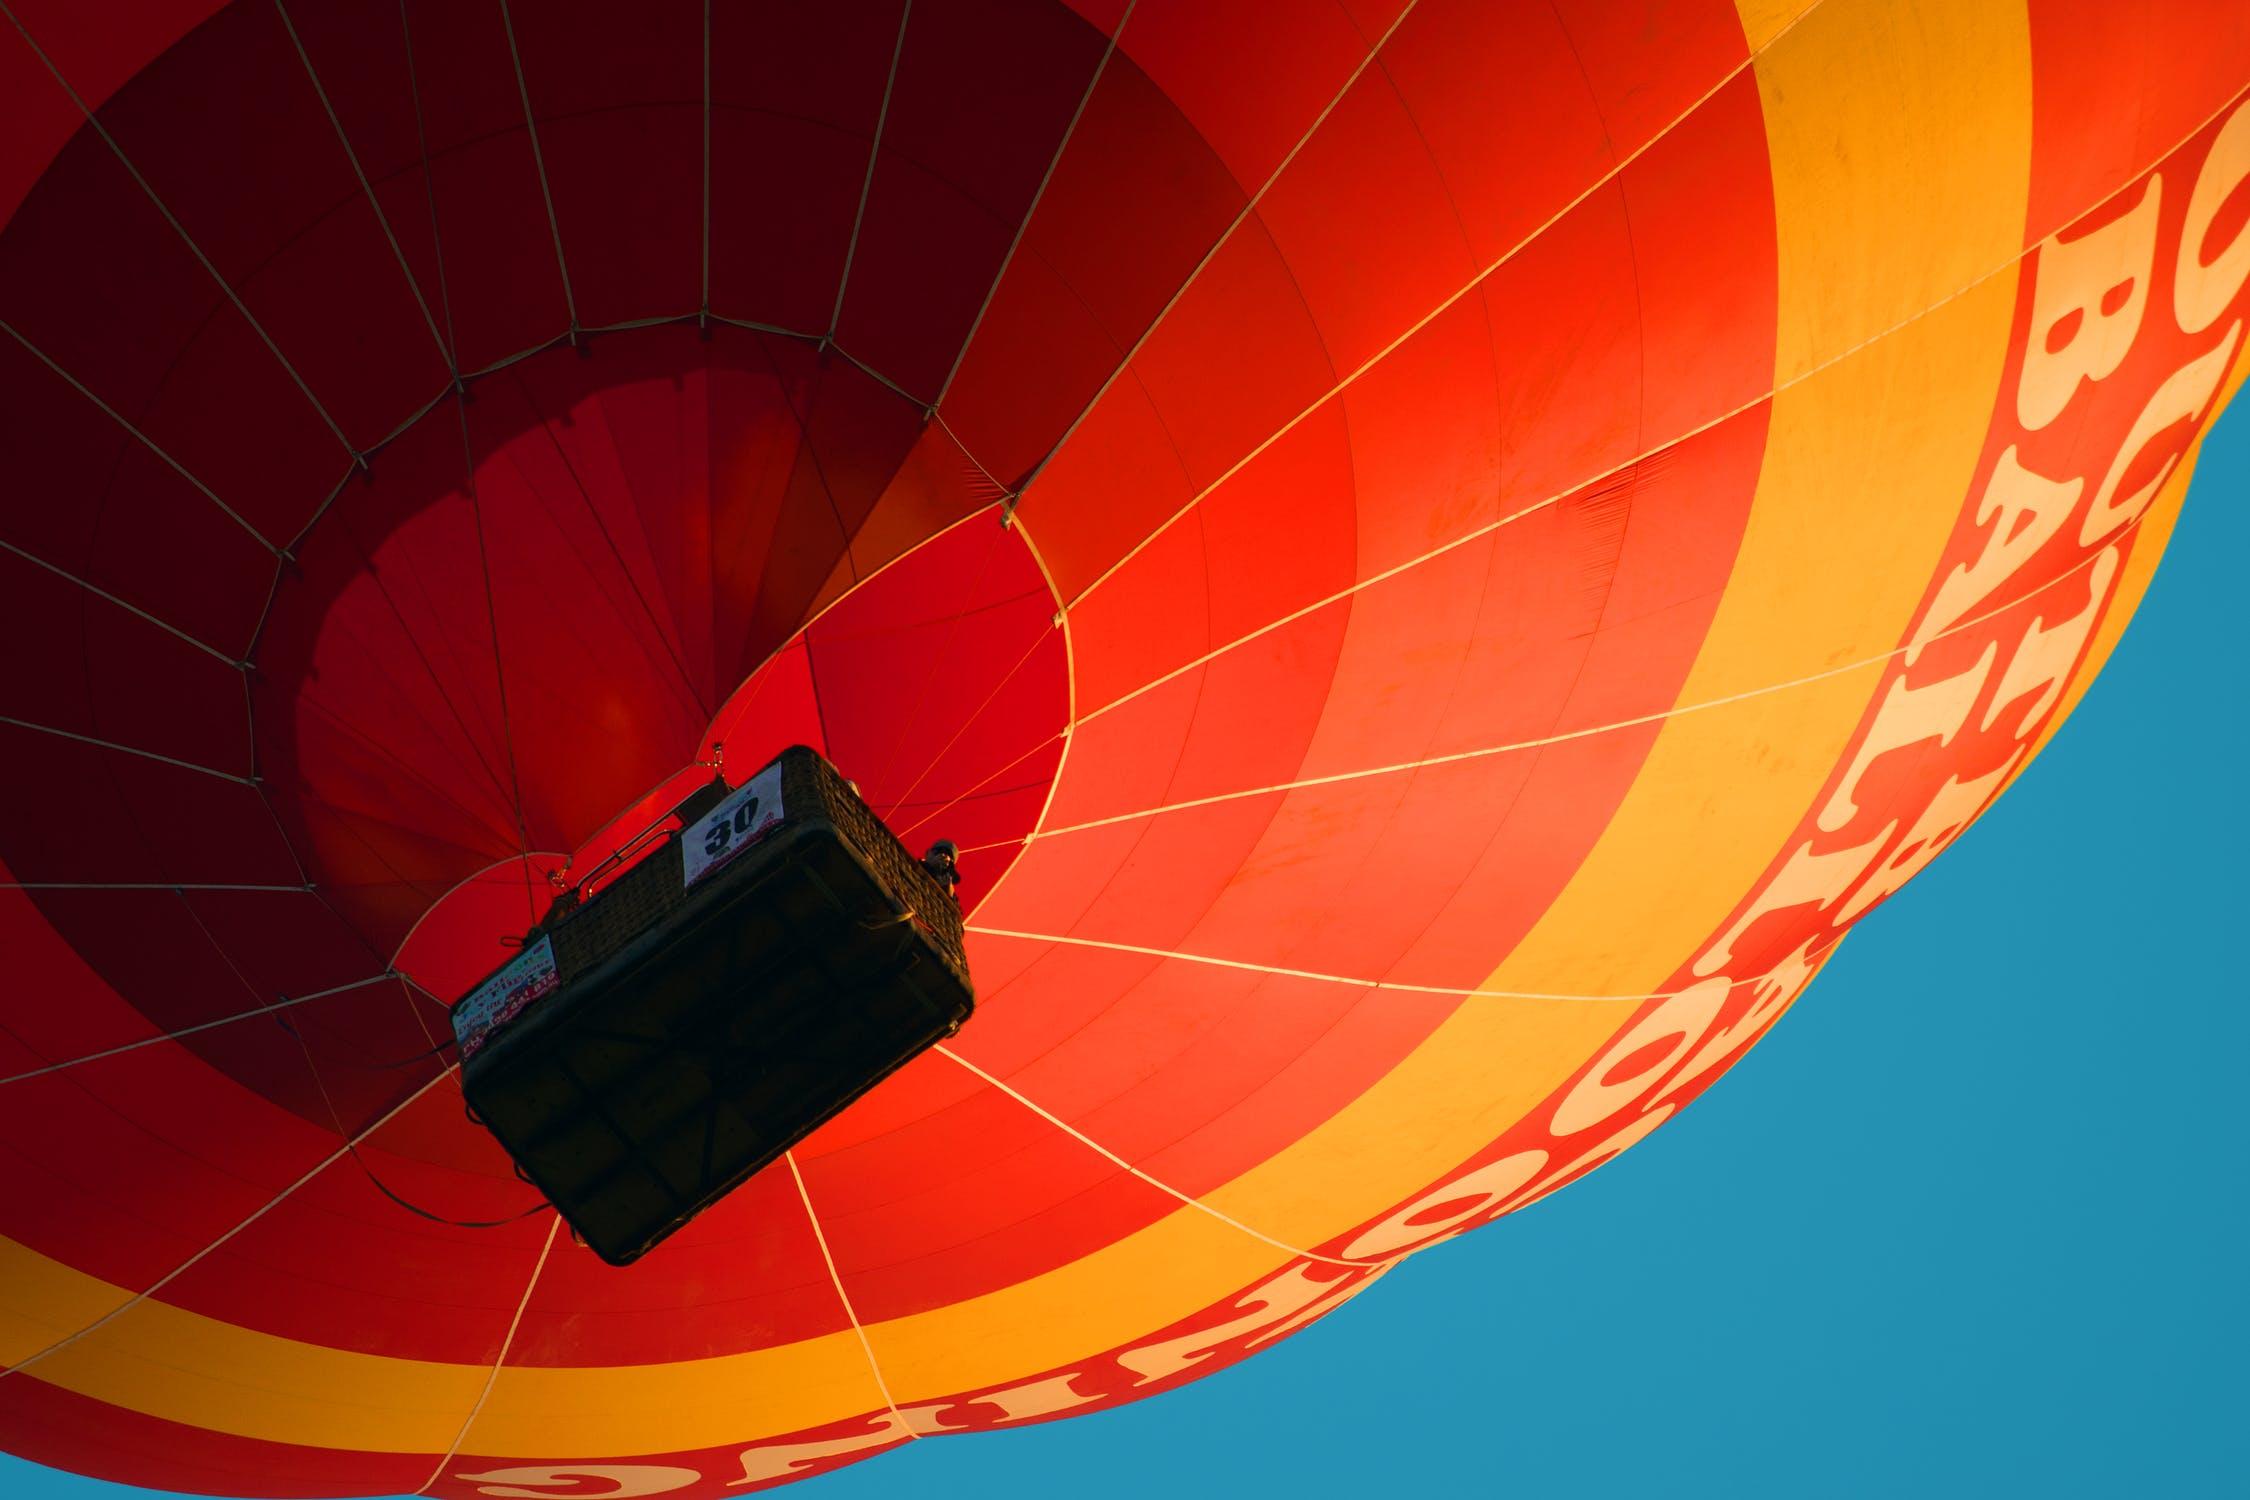 hot-air-balloon-under